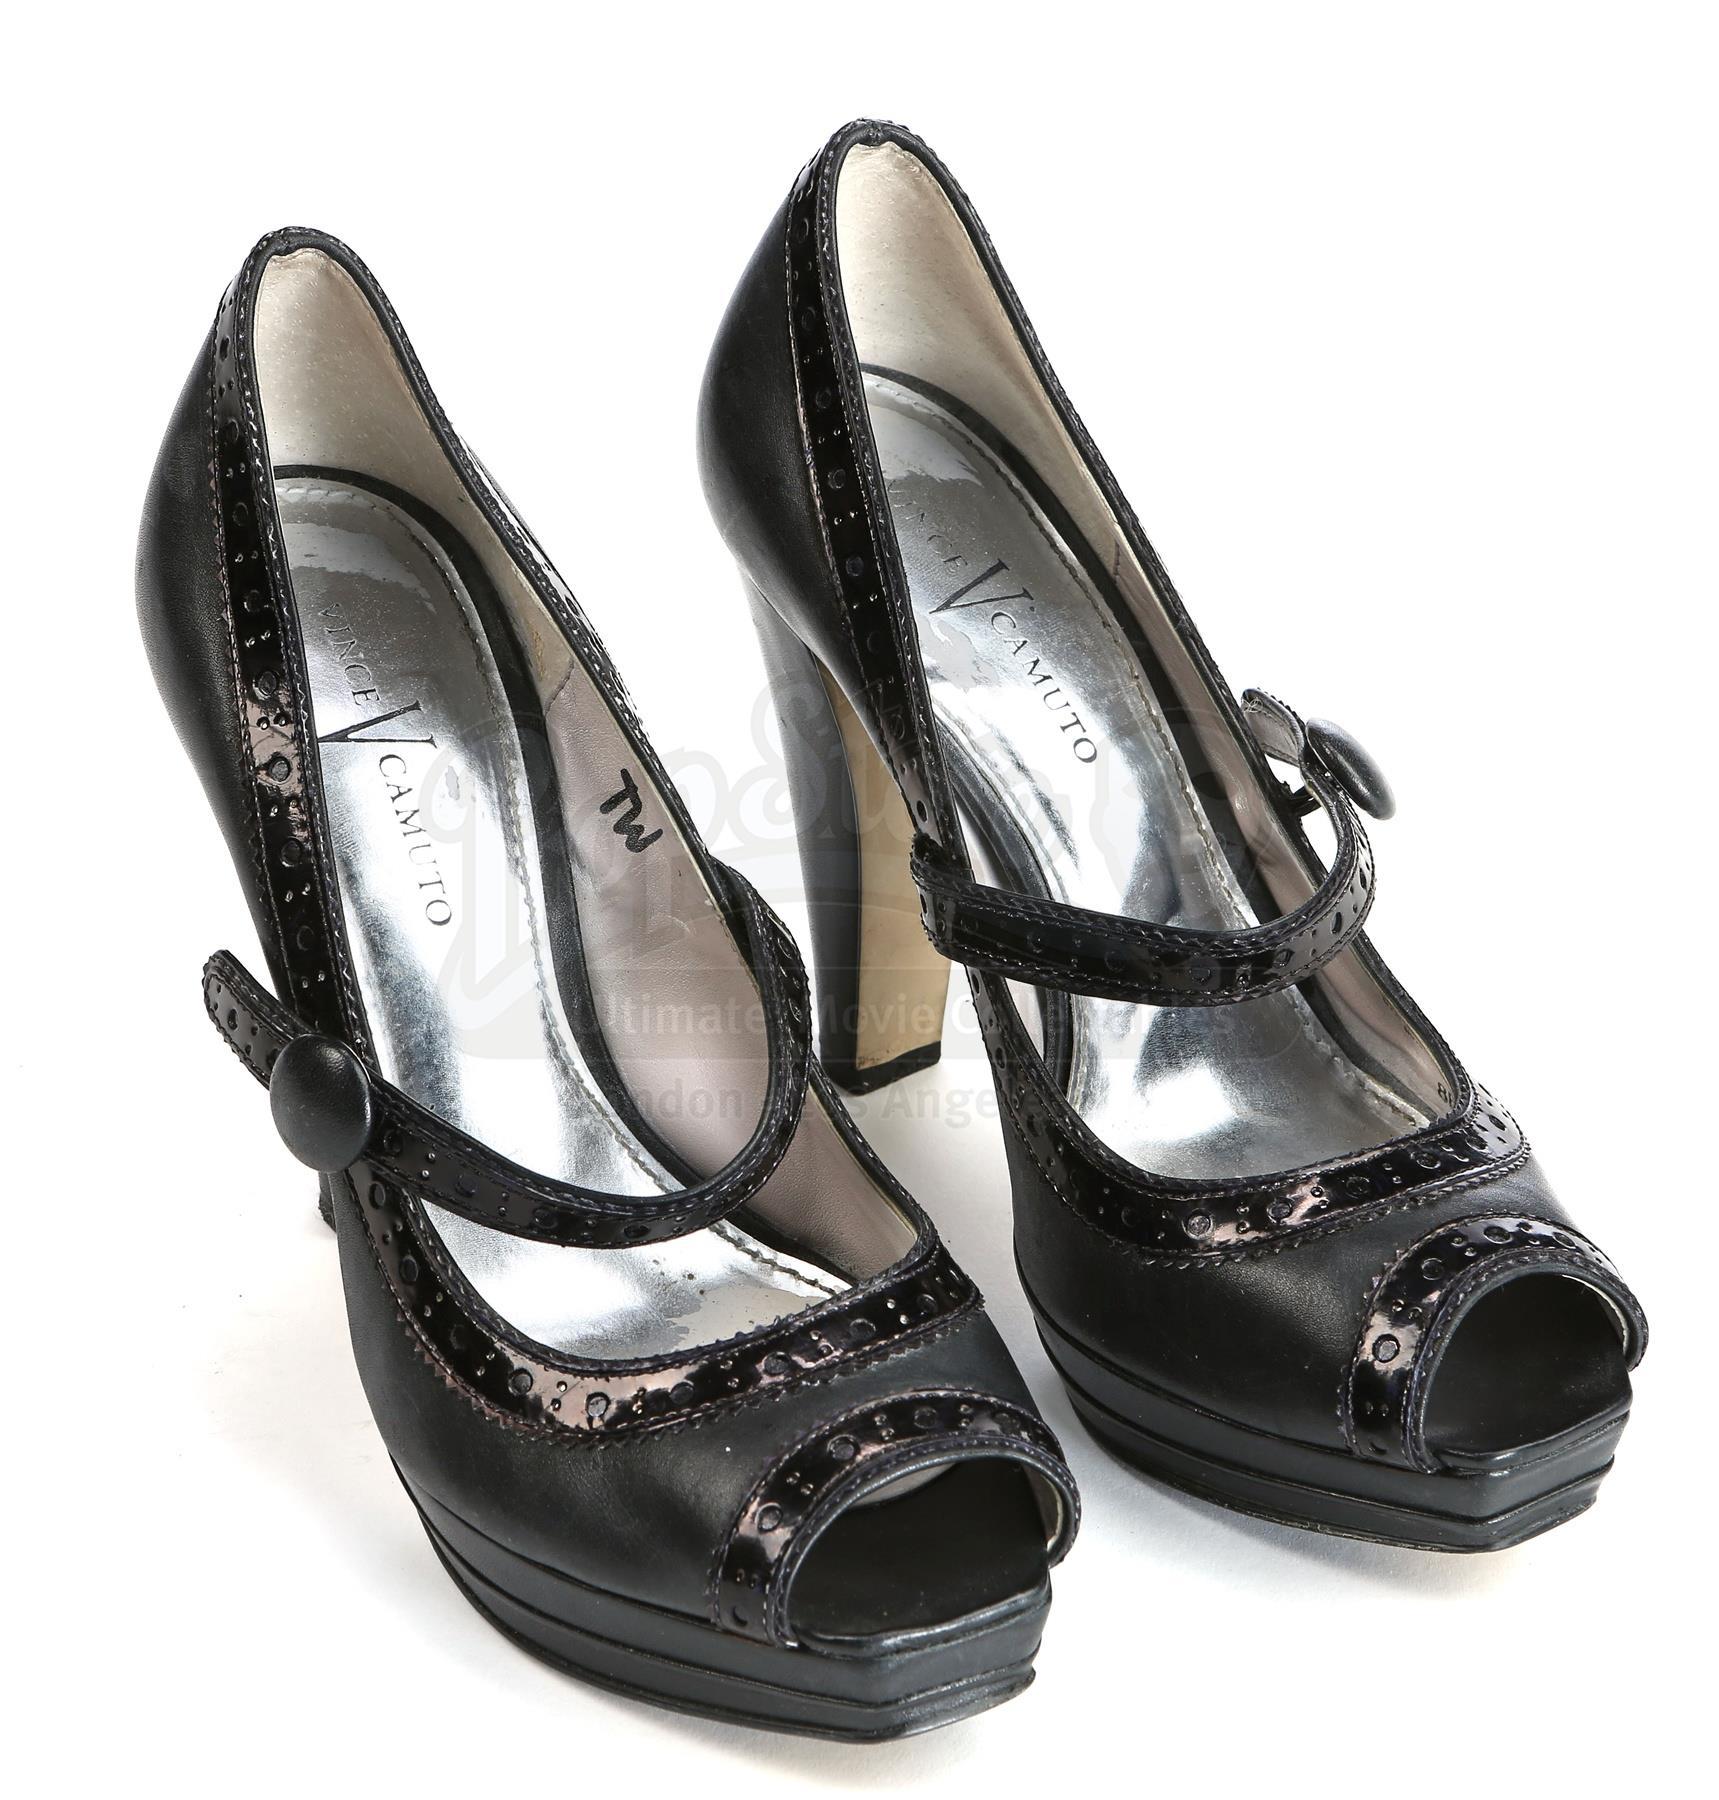 Rosalie S Shoes In Twilight